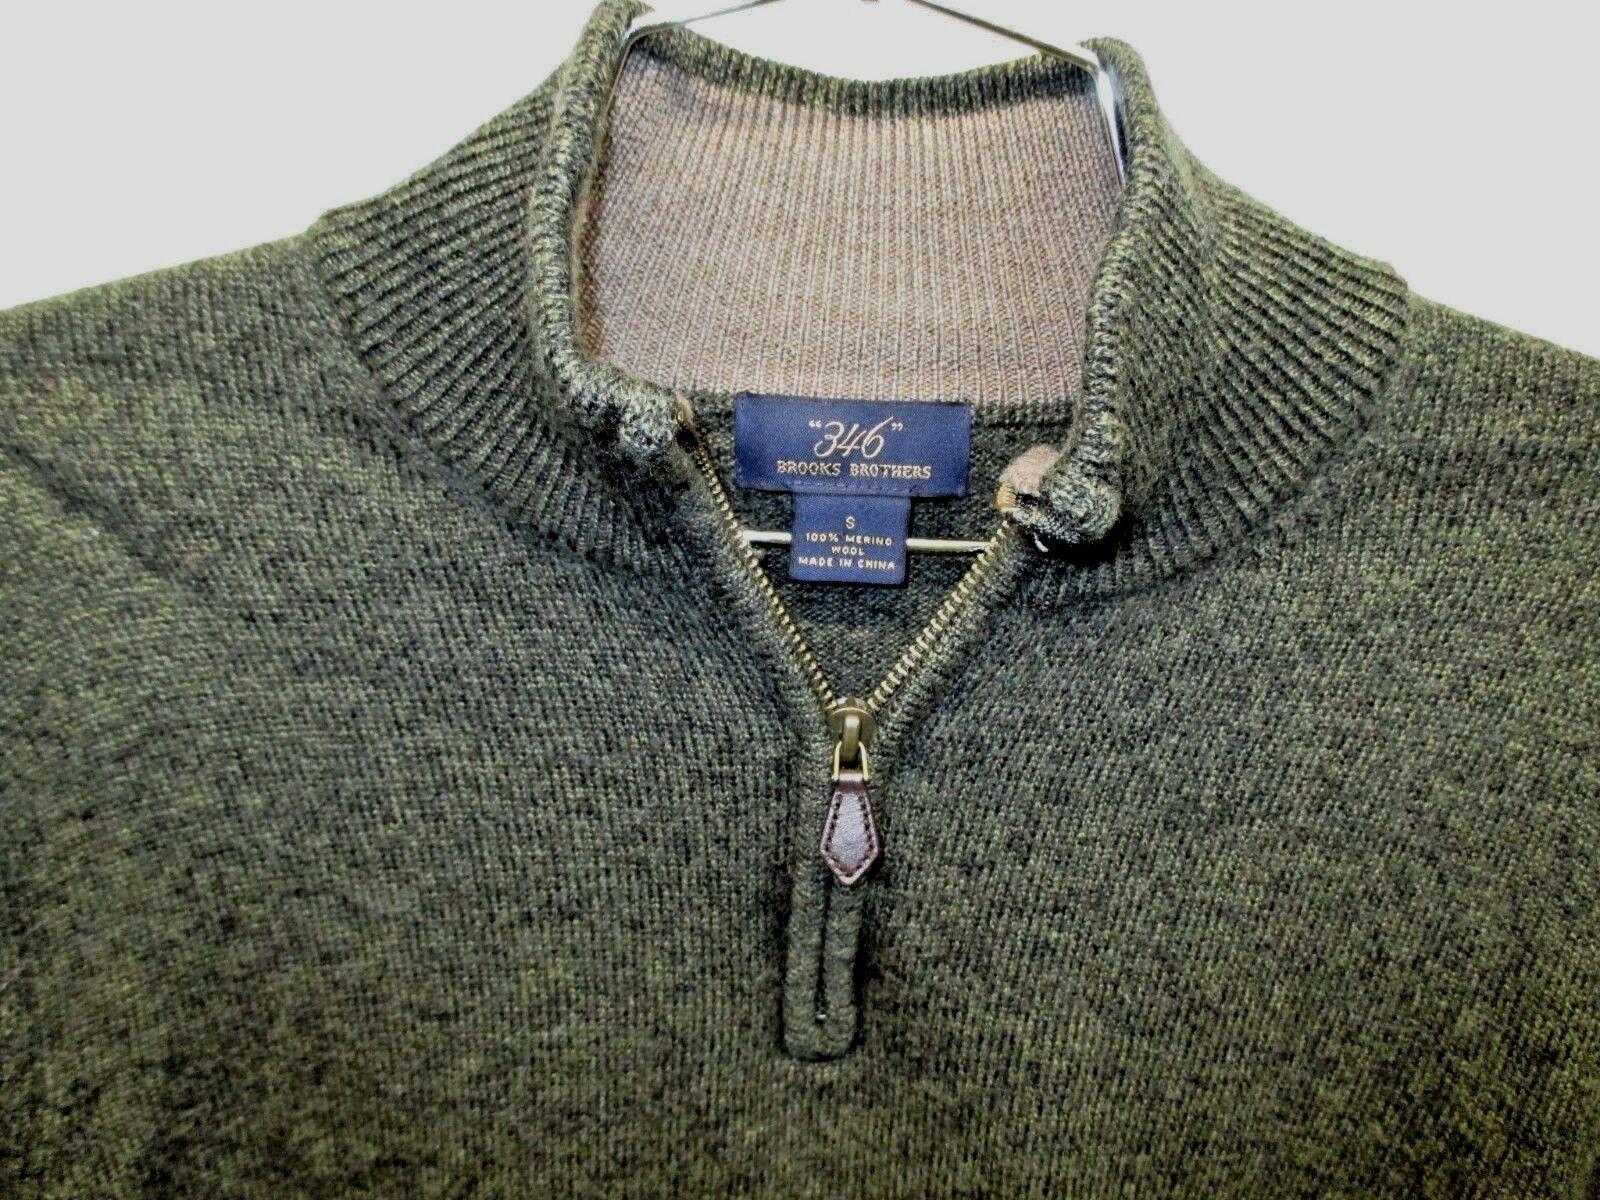 EUC  Brooks Brothers 346 100% Merino Wool Mossy Grün partial 1 4 Zipper superb